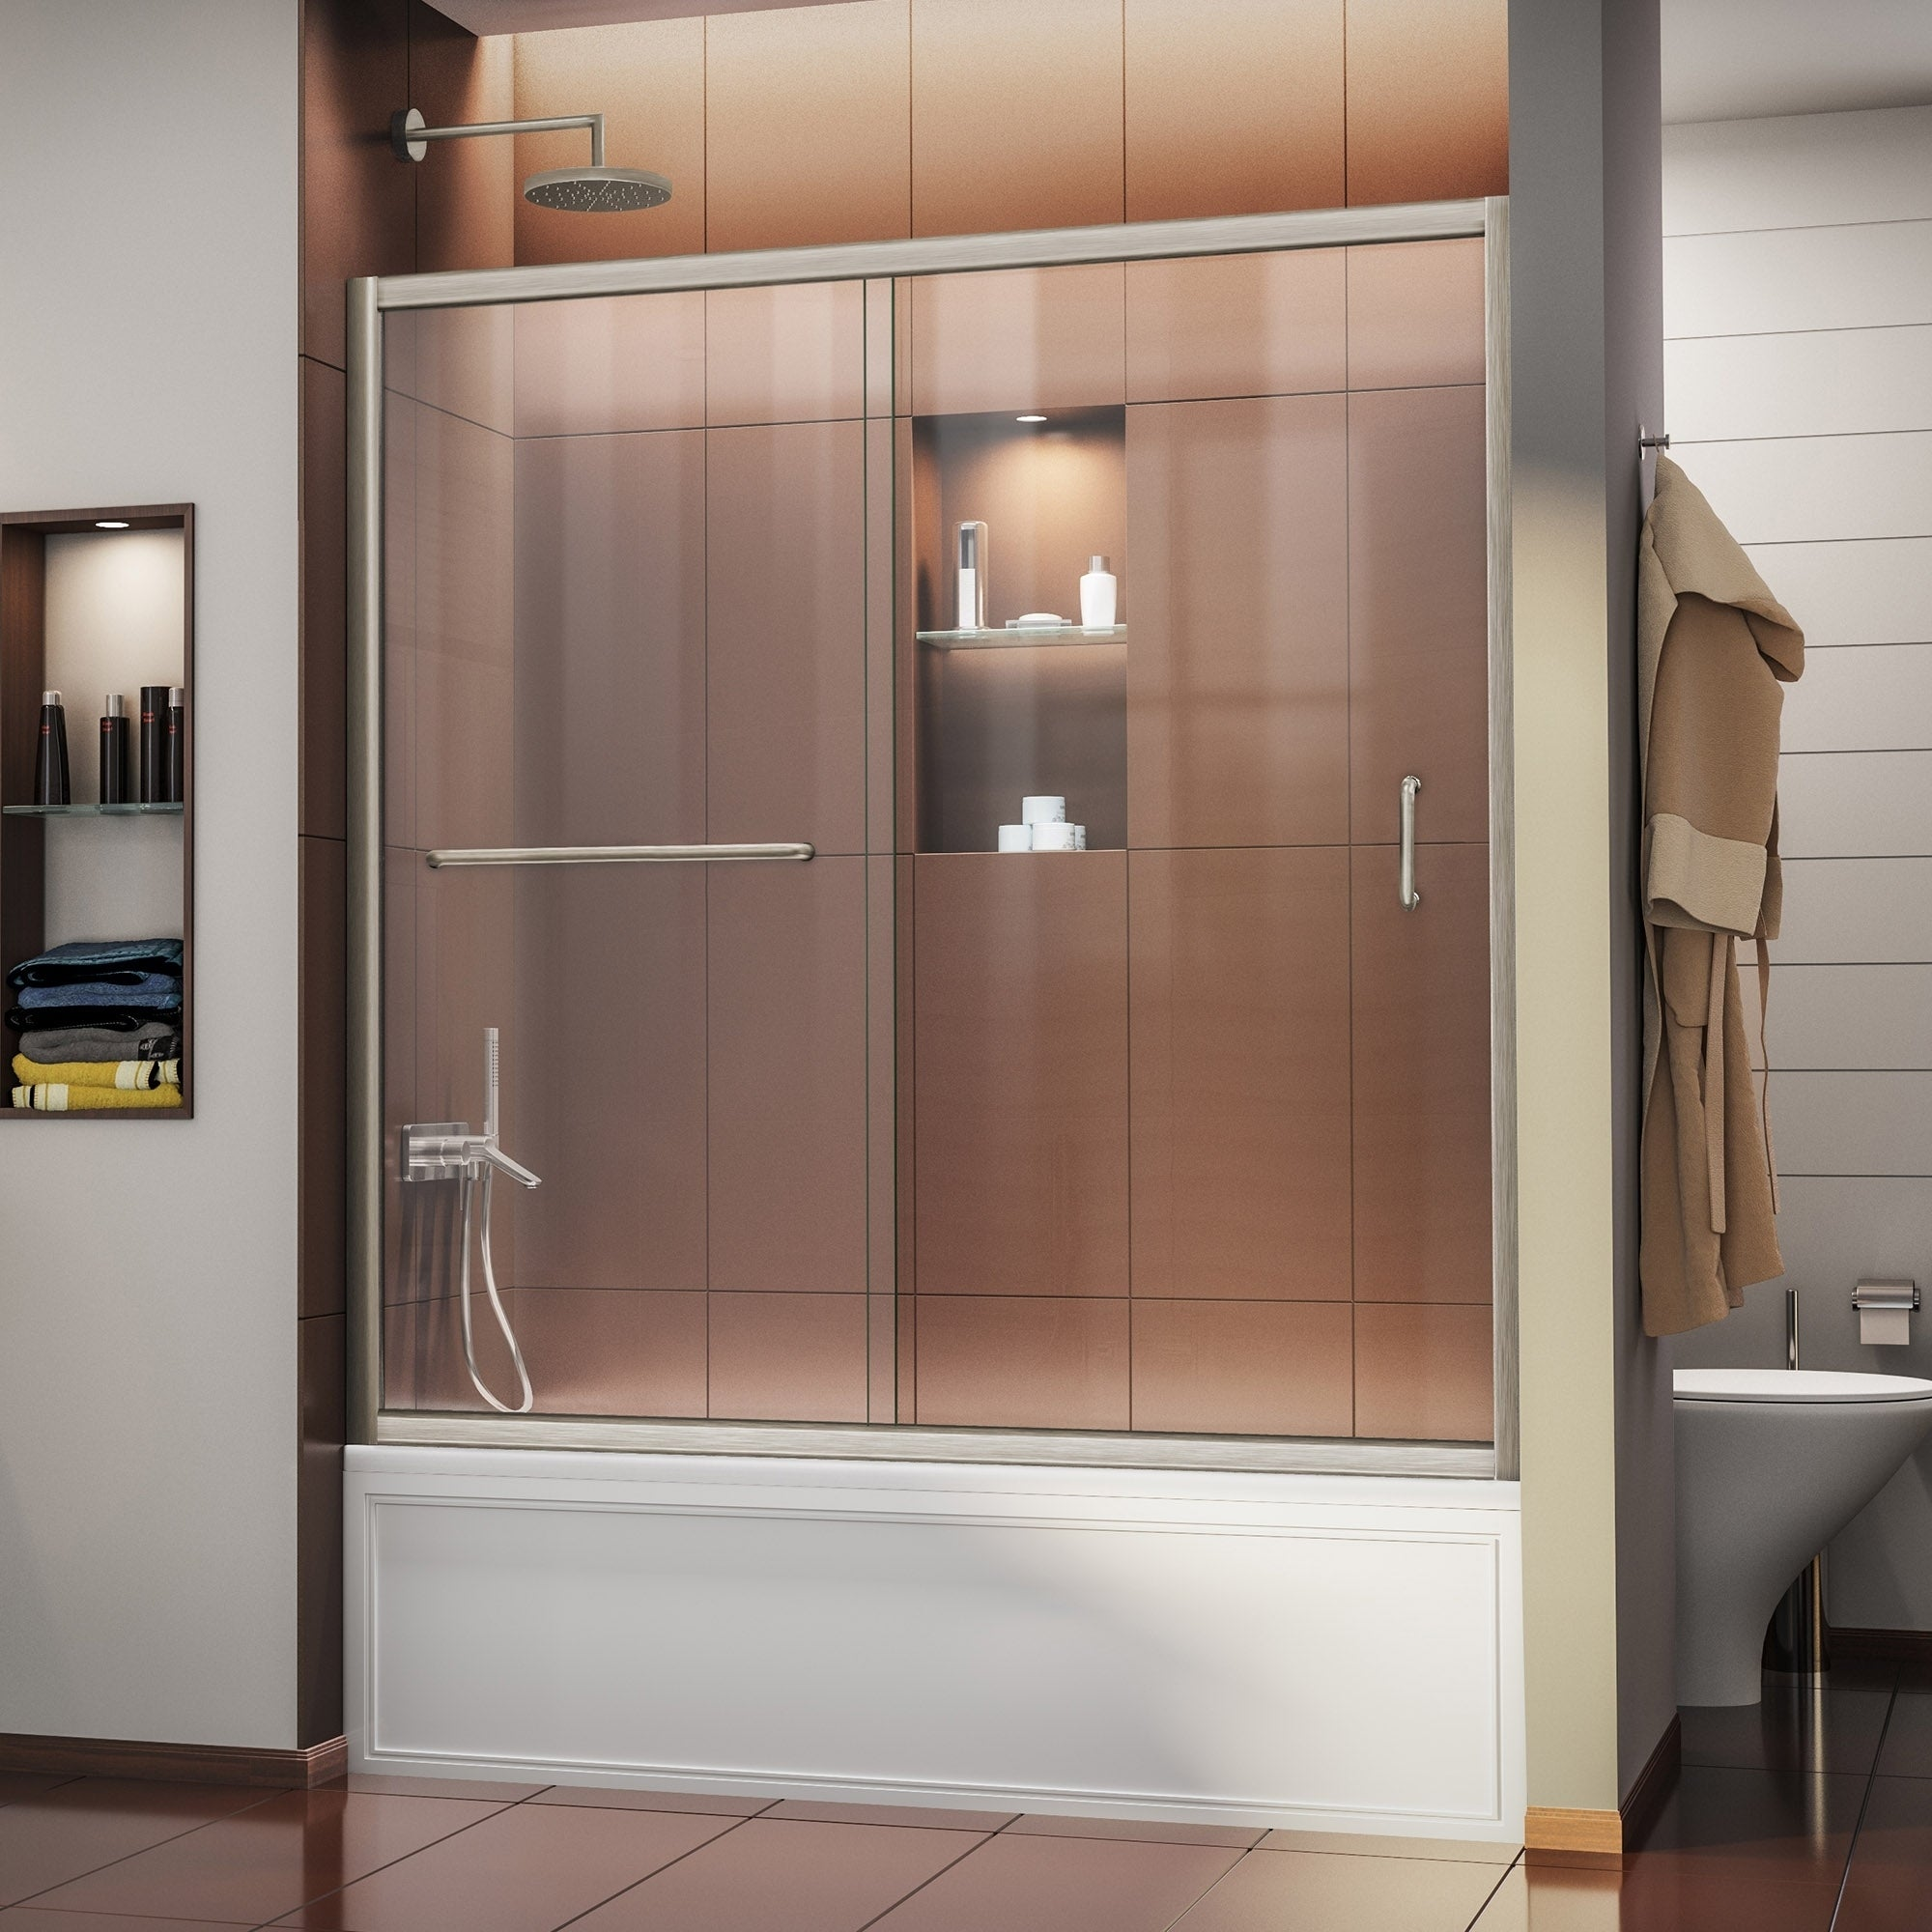 Dreamline Infinity Z 56 60 In W X 58 In H Semi Frameless Sliding Tub Door 56 60 W